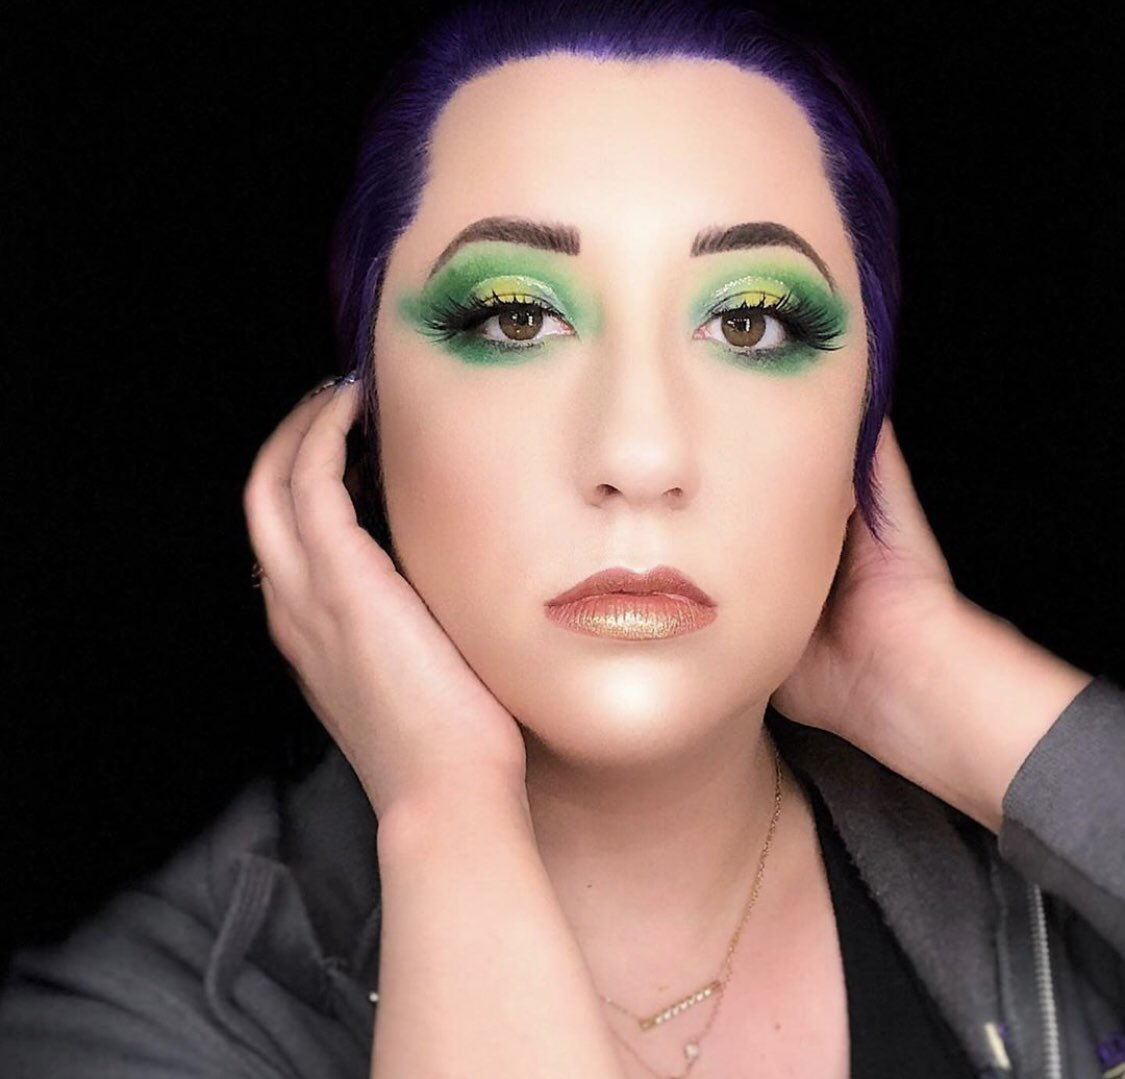 Inspiration was thanks to the delicious #pineapplewhipfreeze from @tacobell  #juviasplace #urbandecaycosmetics #wetnwildbeauty #elfcosmetics #eyeshadow #makeup #fullfacemakeup #greenmakeup #cutcrease #glittermakeup #mue #highlight #motd #wakeupandmakeup #lashes #lipstickpic.twitter.com/T9ECZWWBIP